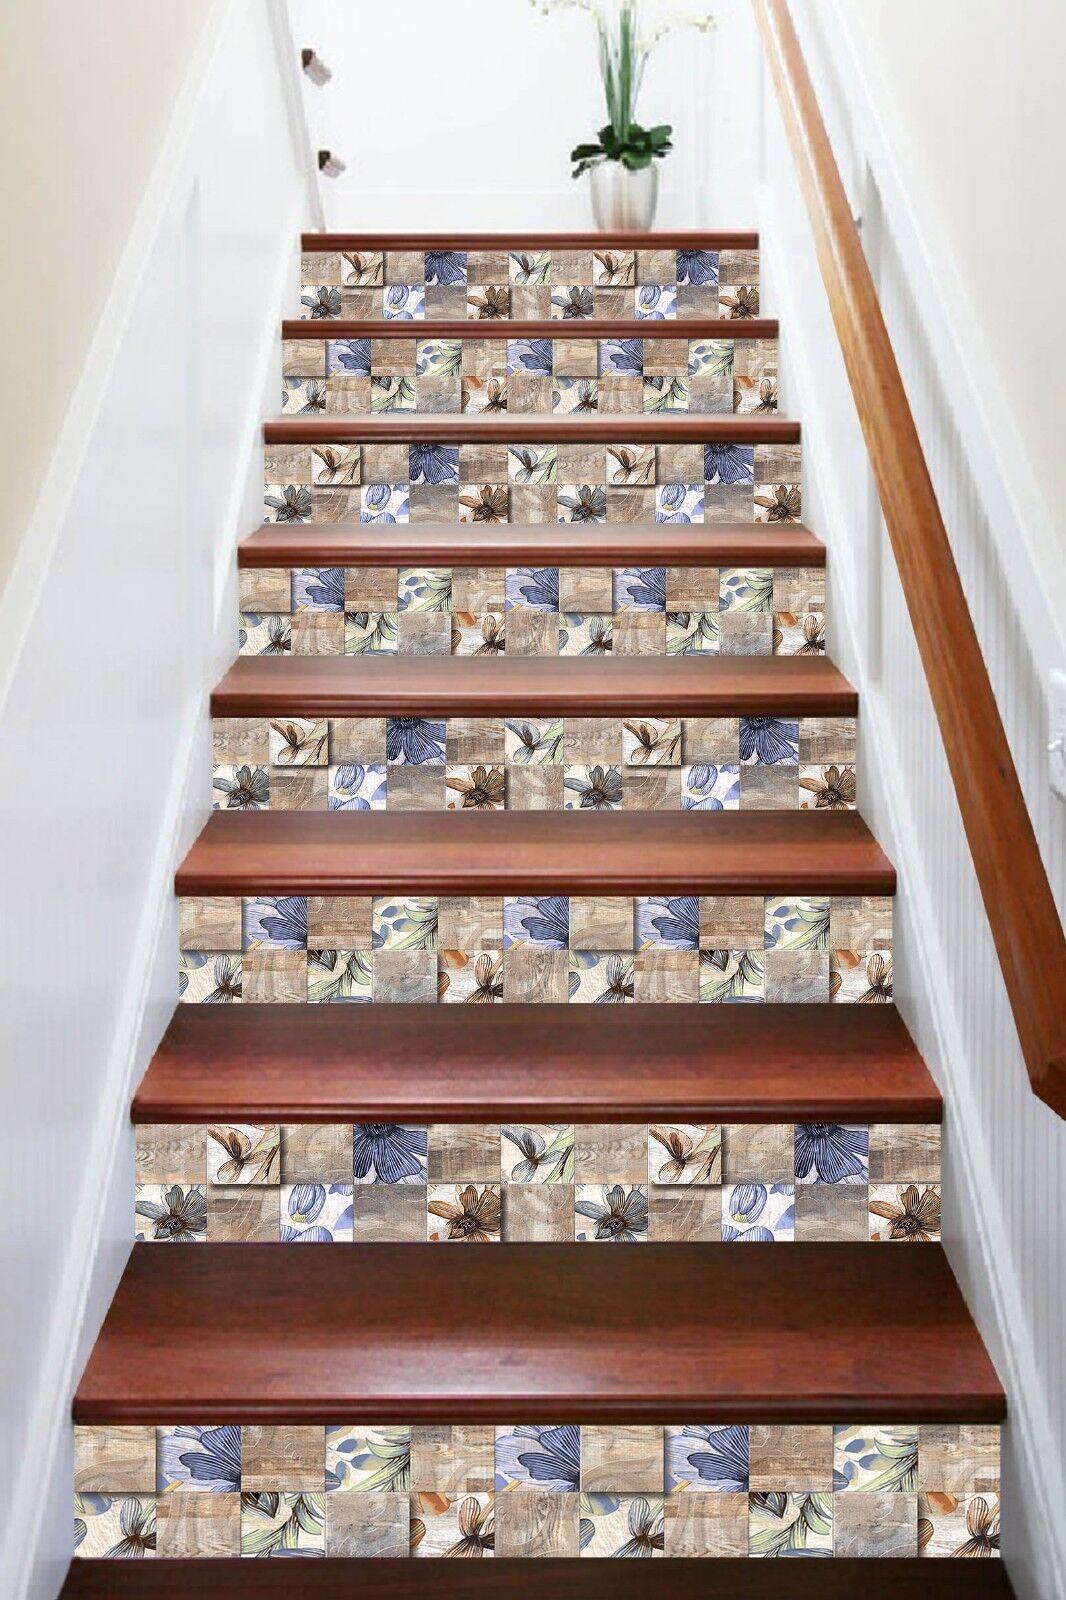 3D Fashion Floral 1 Tile Marble Stair Risers Decoration Mural Vinyl Wallpaper